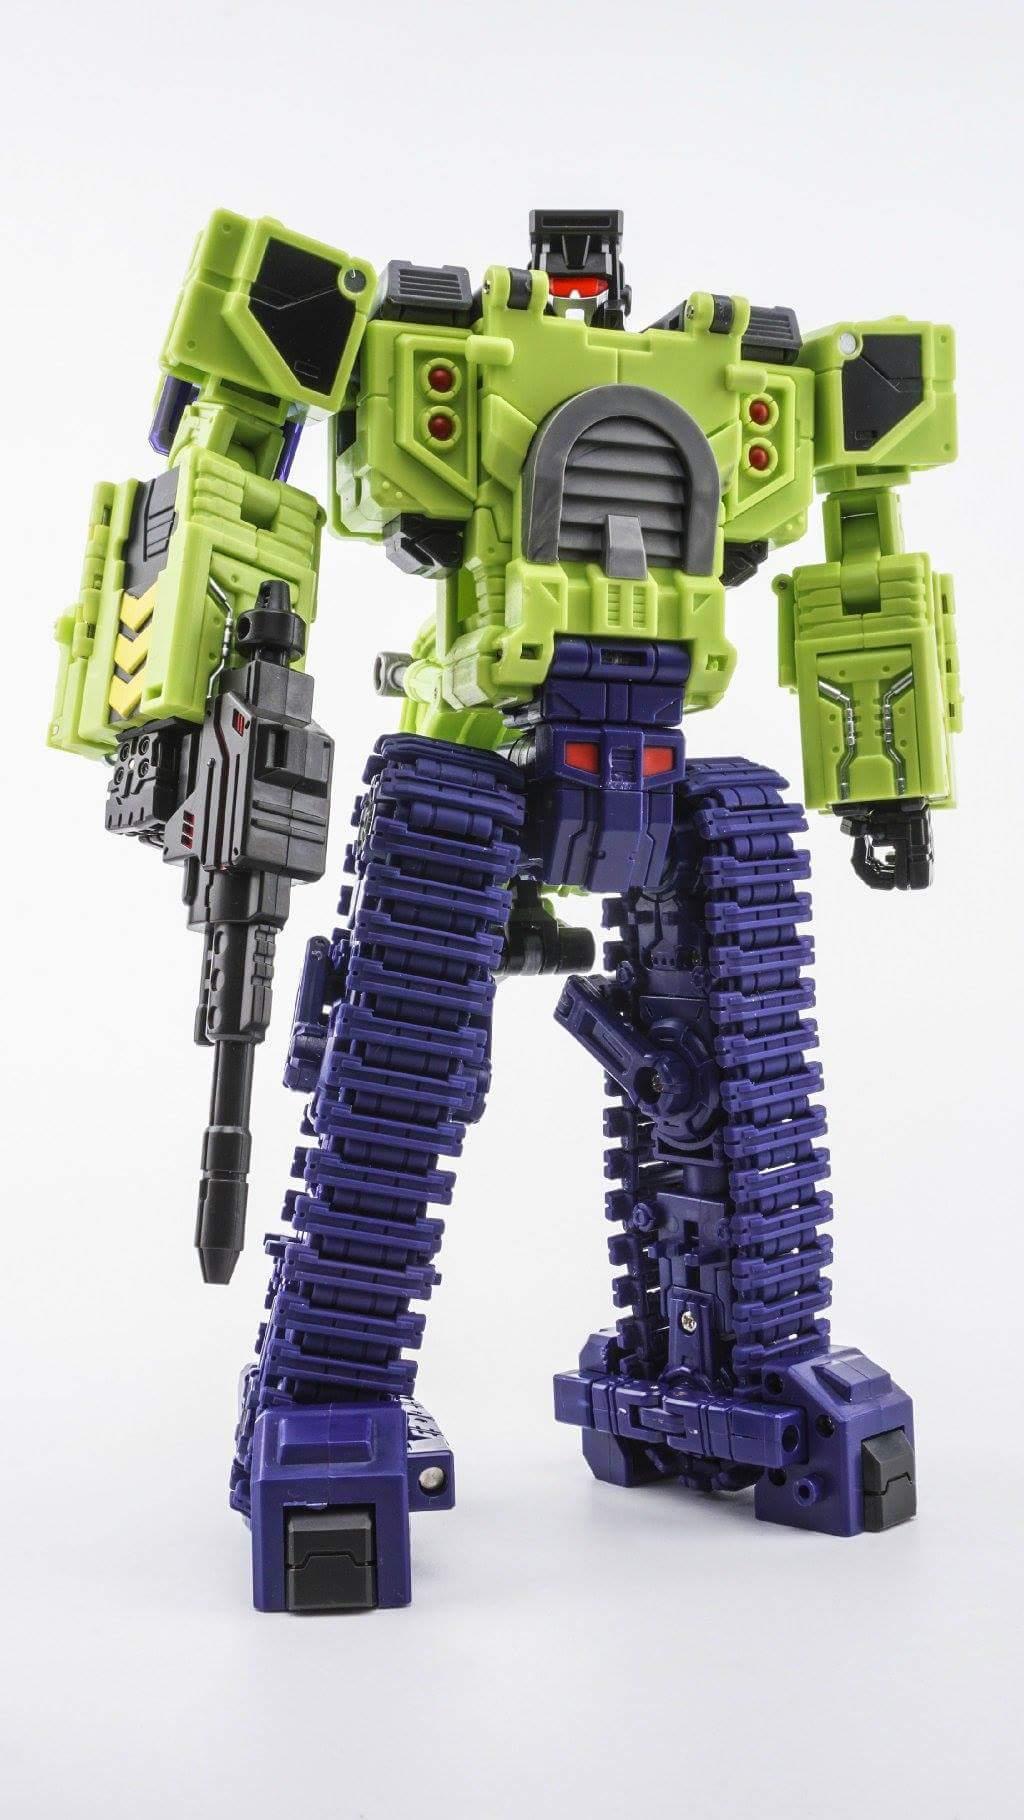 [Toyworld] Produit Tiers - Jouet TW-C Constructor aka Devastator/Dévastateur (Version vert G1 et jaune G2) - Page 3 SOLCV6Lk